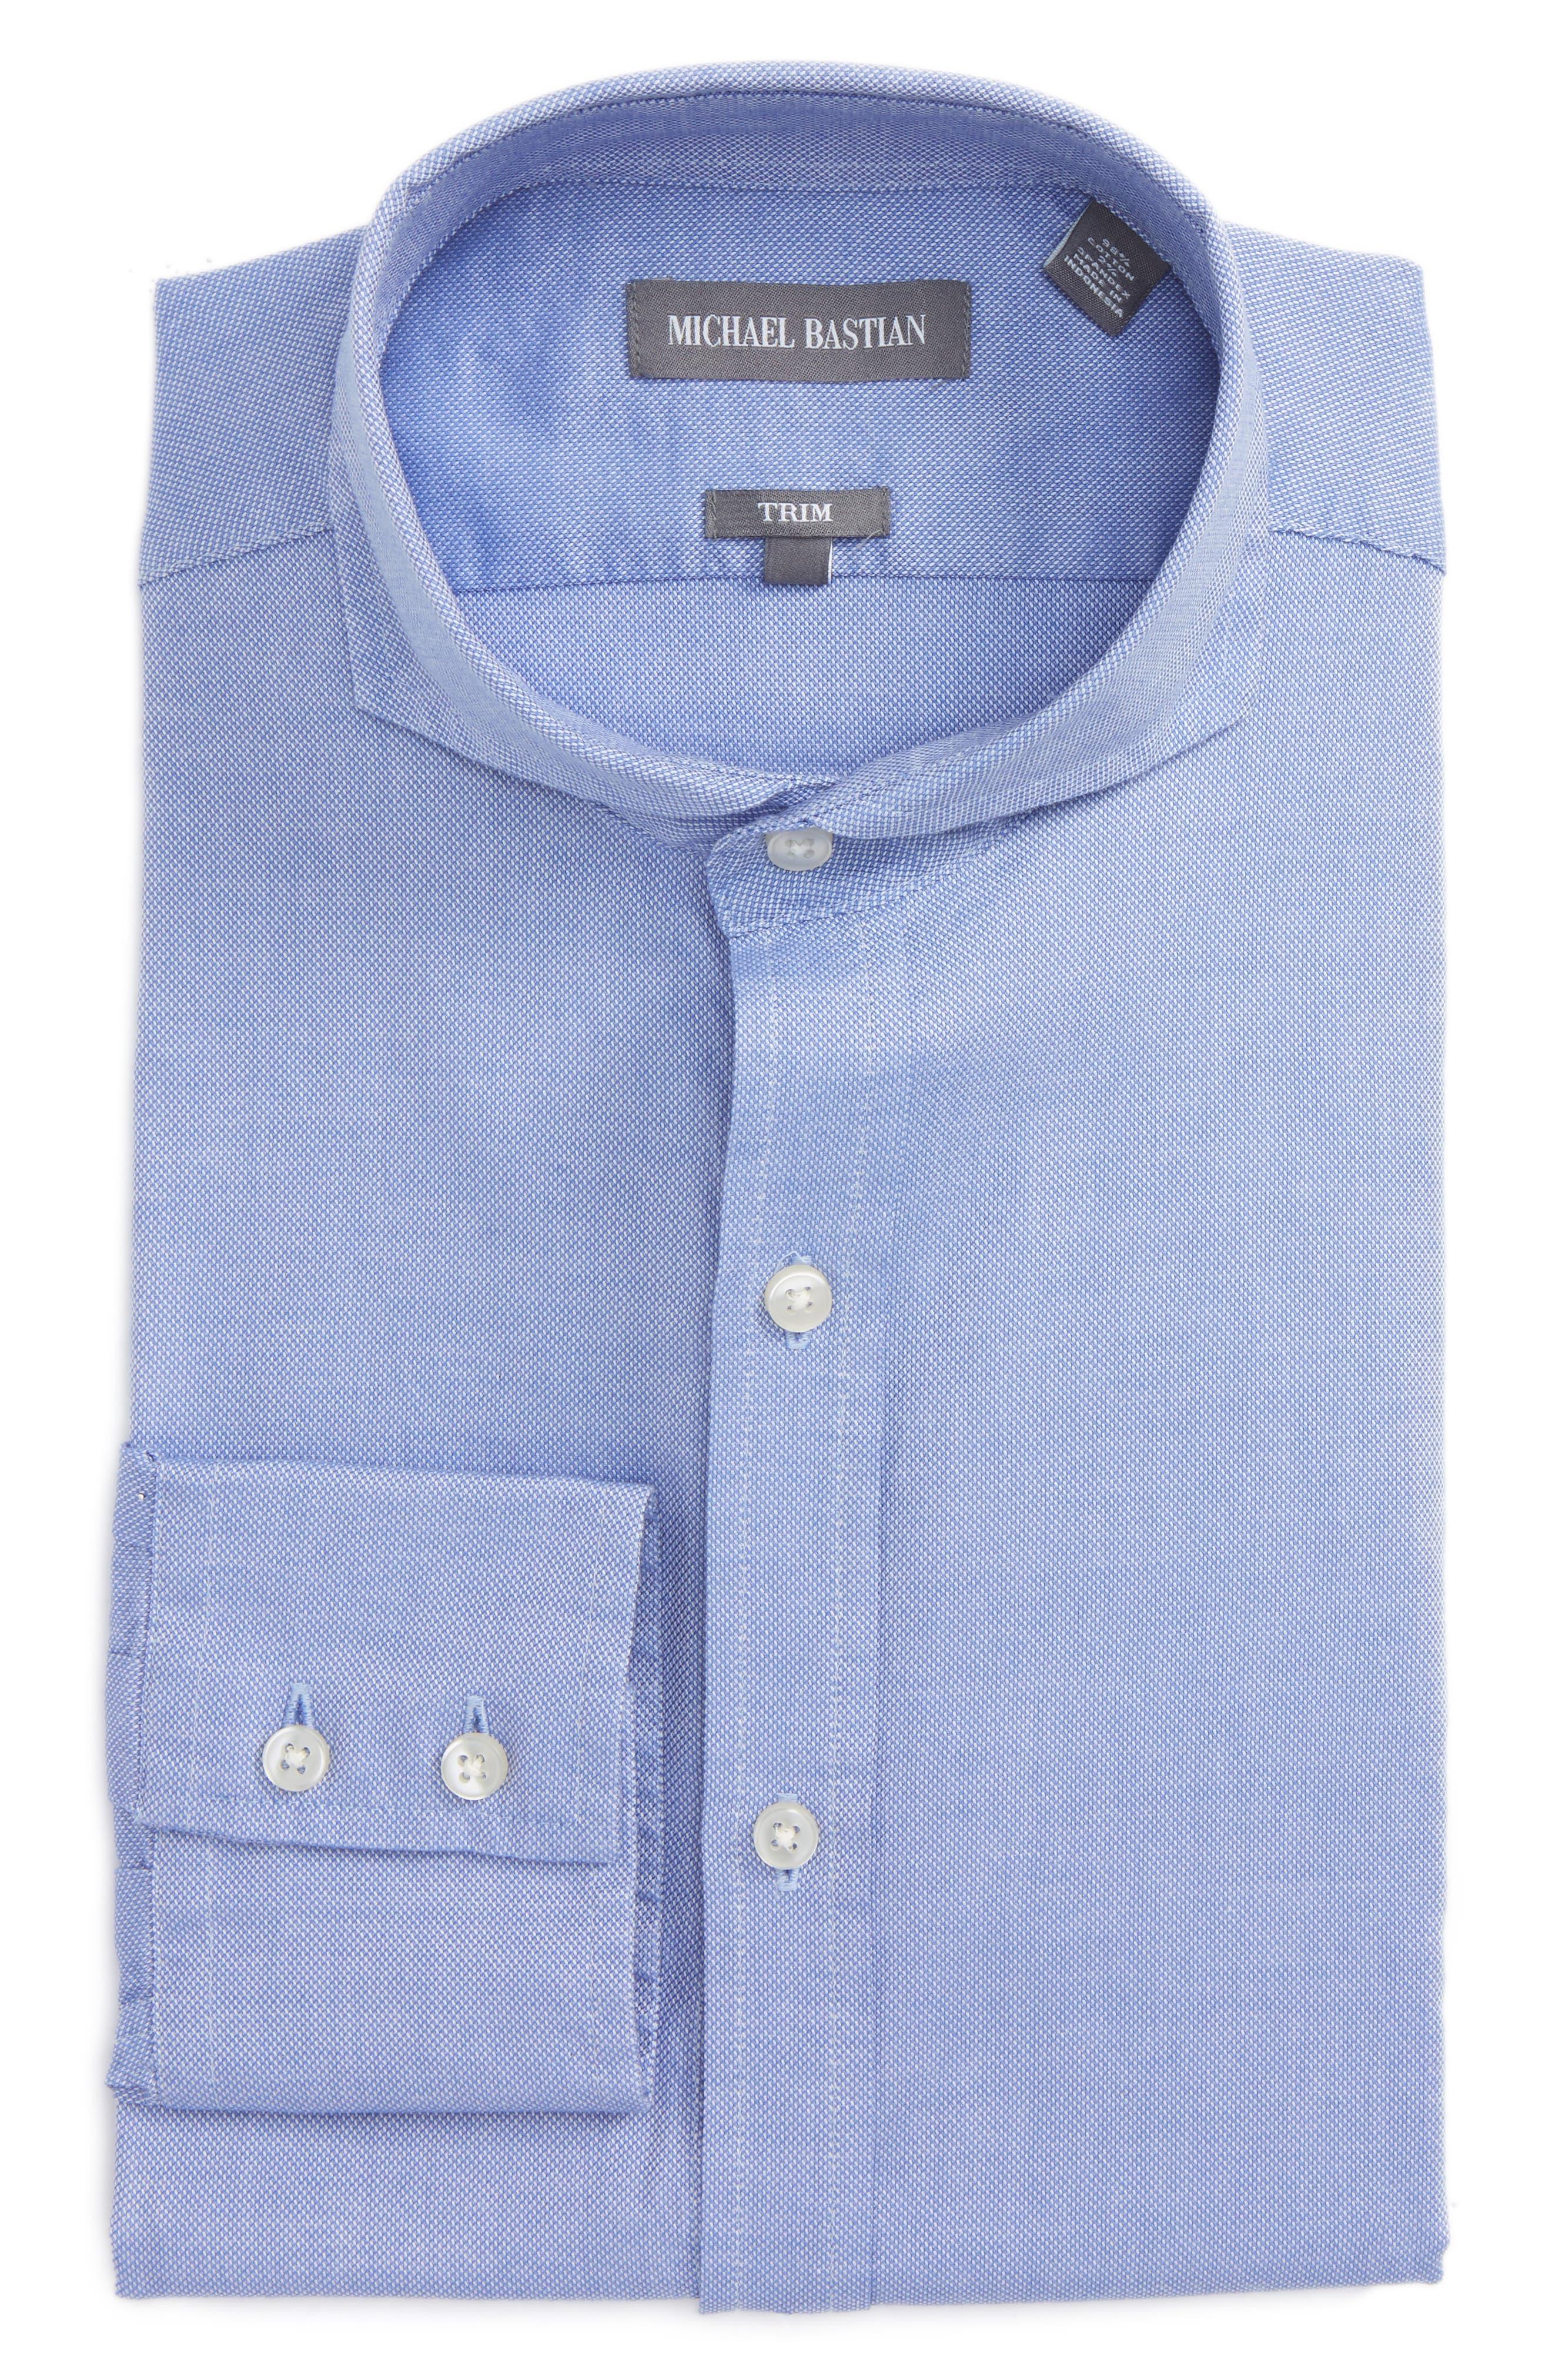 Trim Fit Oxford Dress Shirt,                             Main thumbnail 1, color,